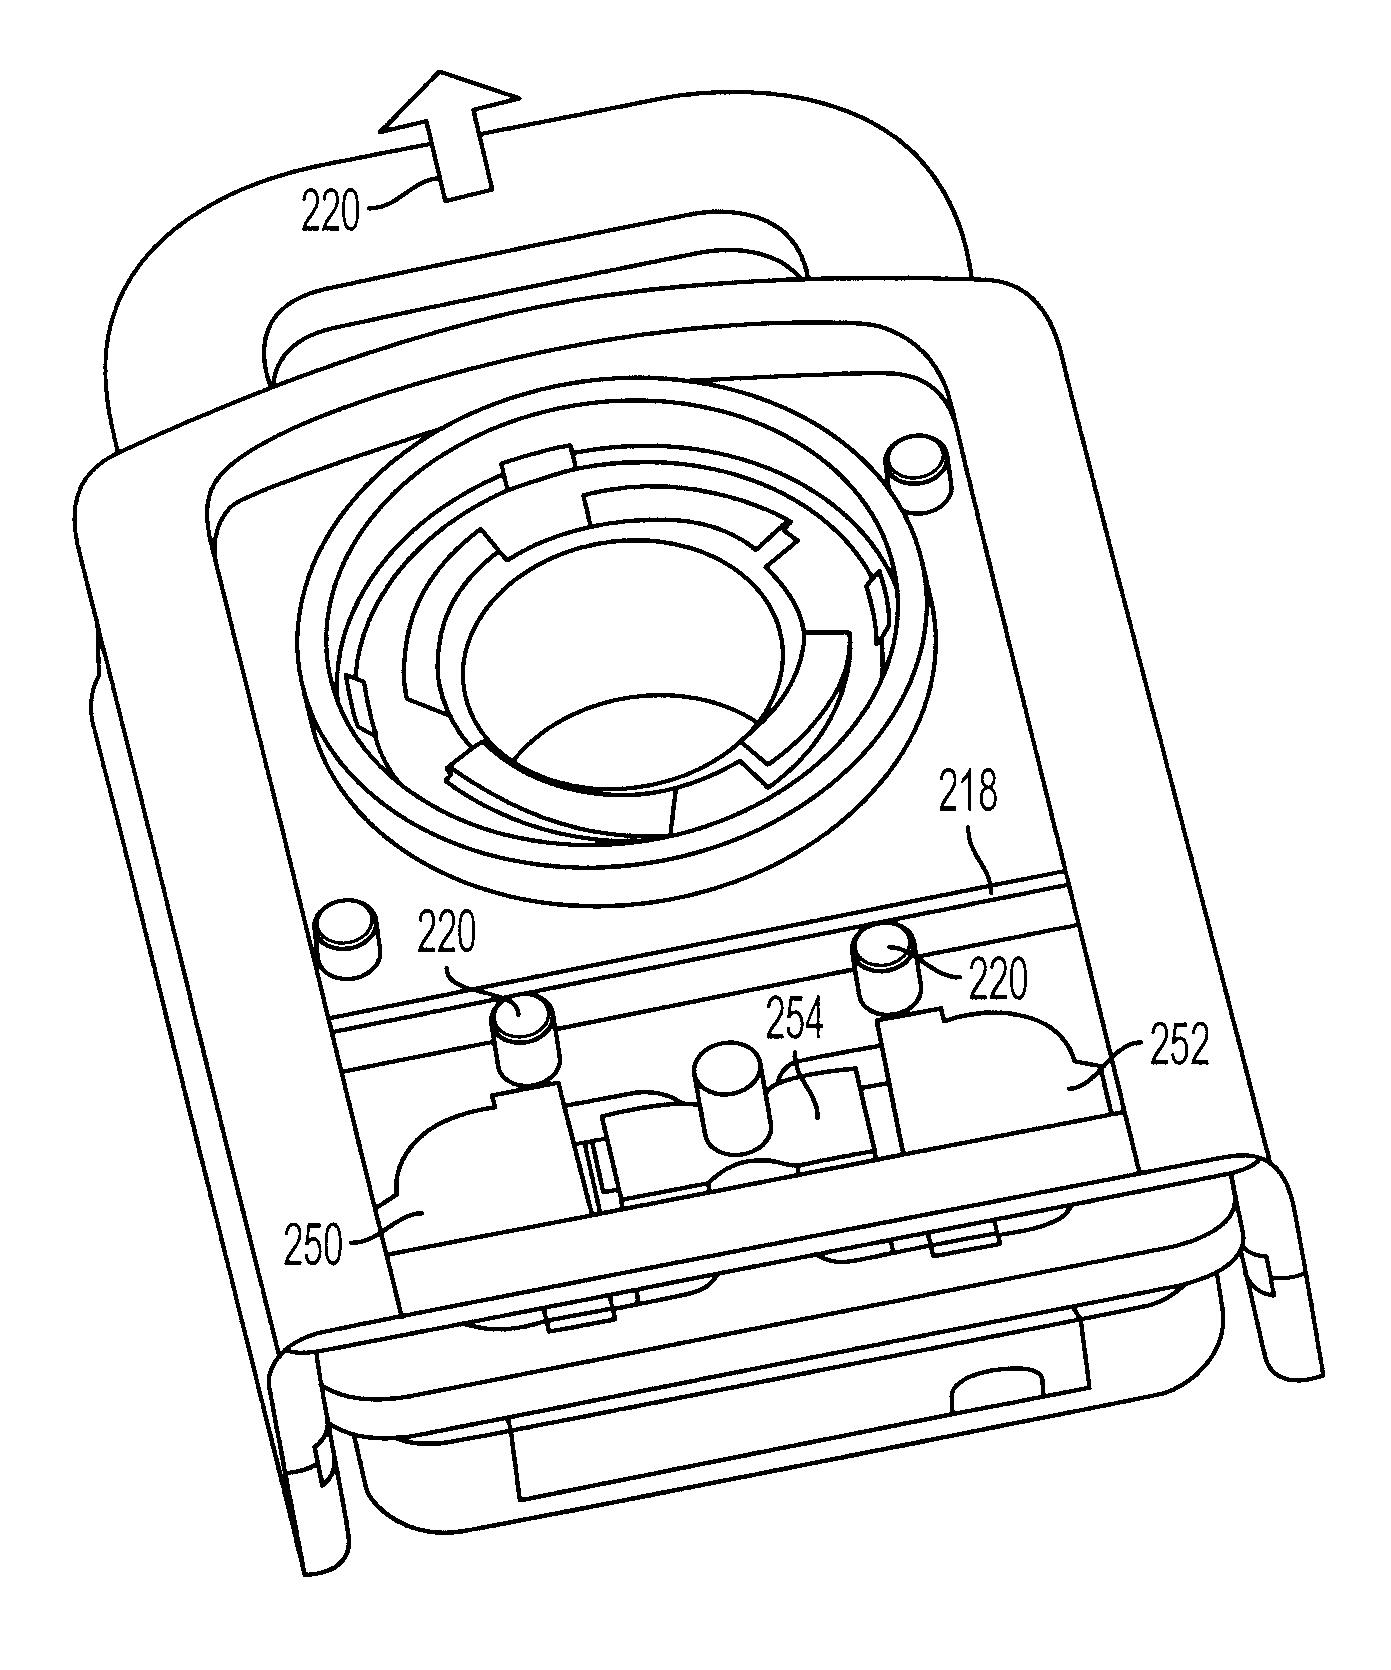 tags: #e320 mercedes belt diagram#benz e320 serpentine belt#1989 mercedes  benz serpentine belt replacement#mercedes ml320 serpentine belt diagram#e320